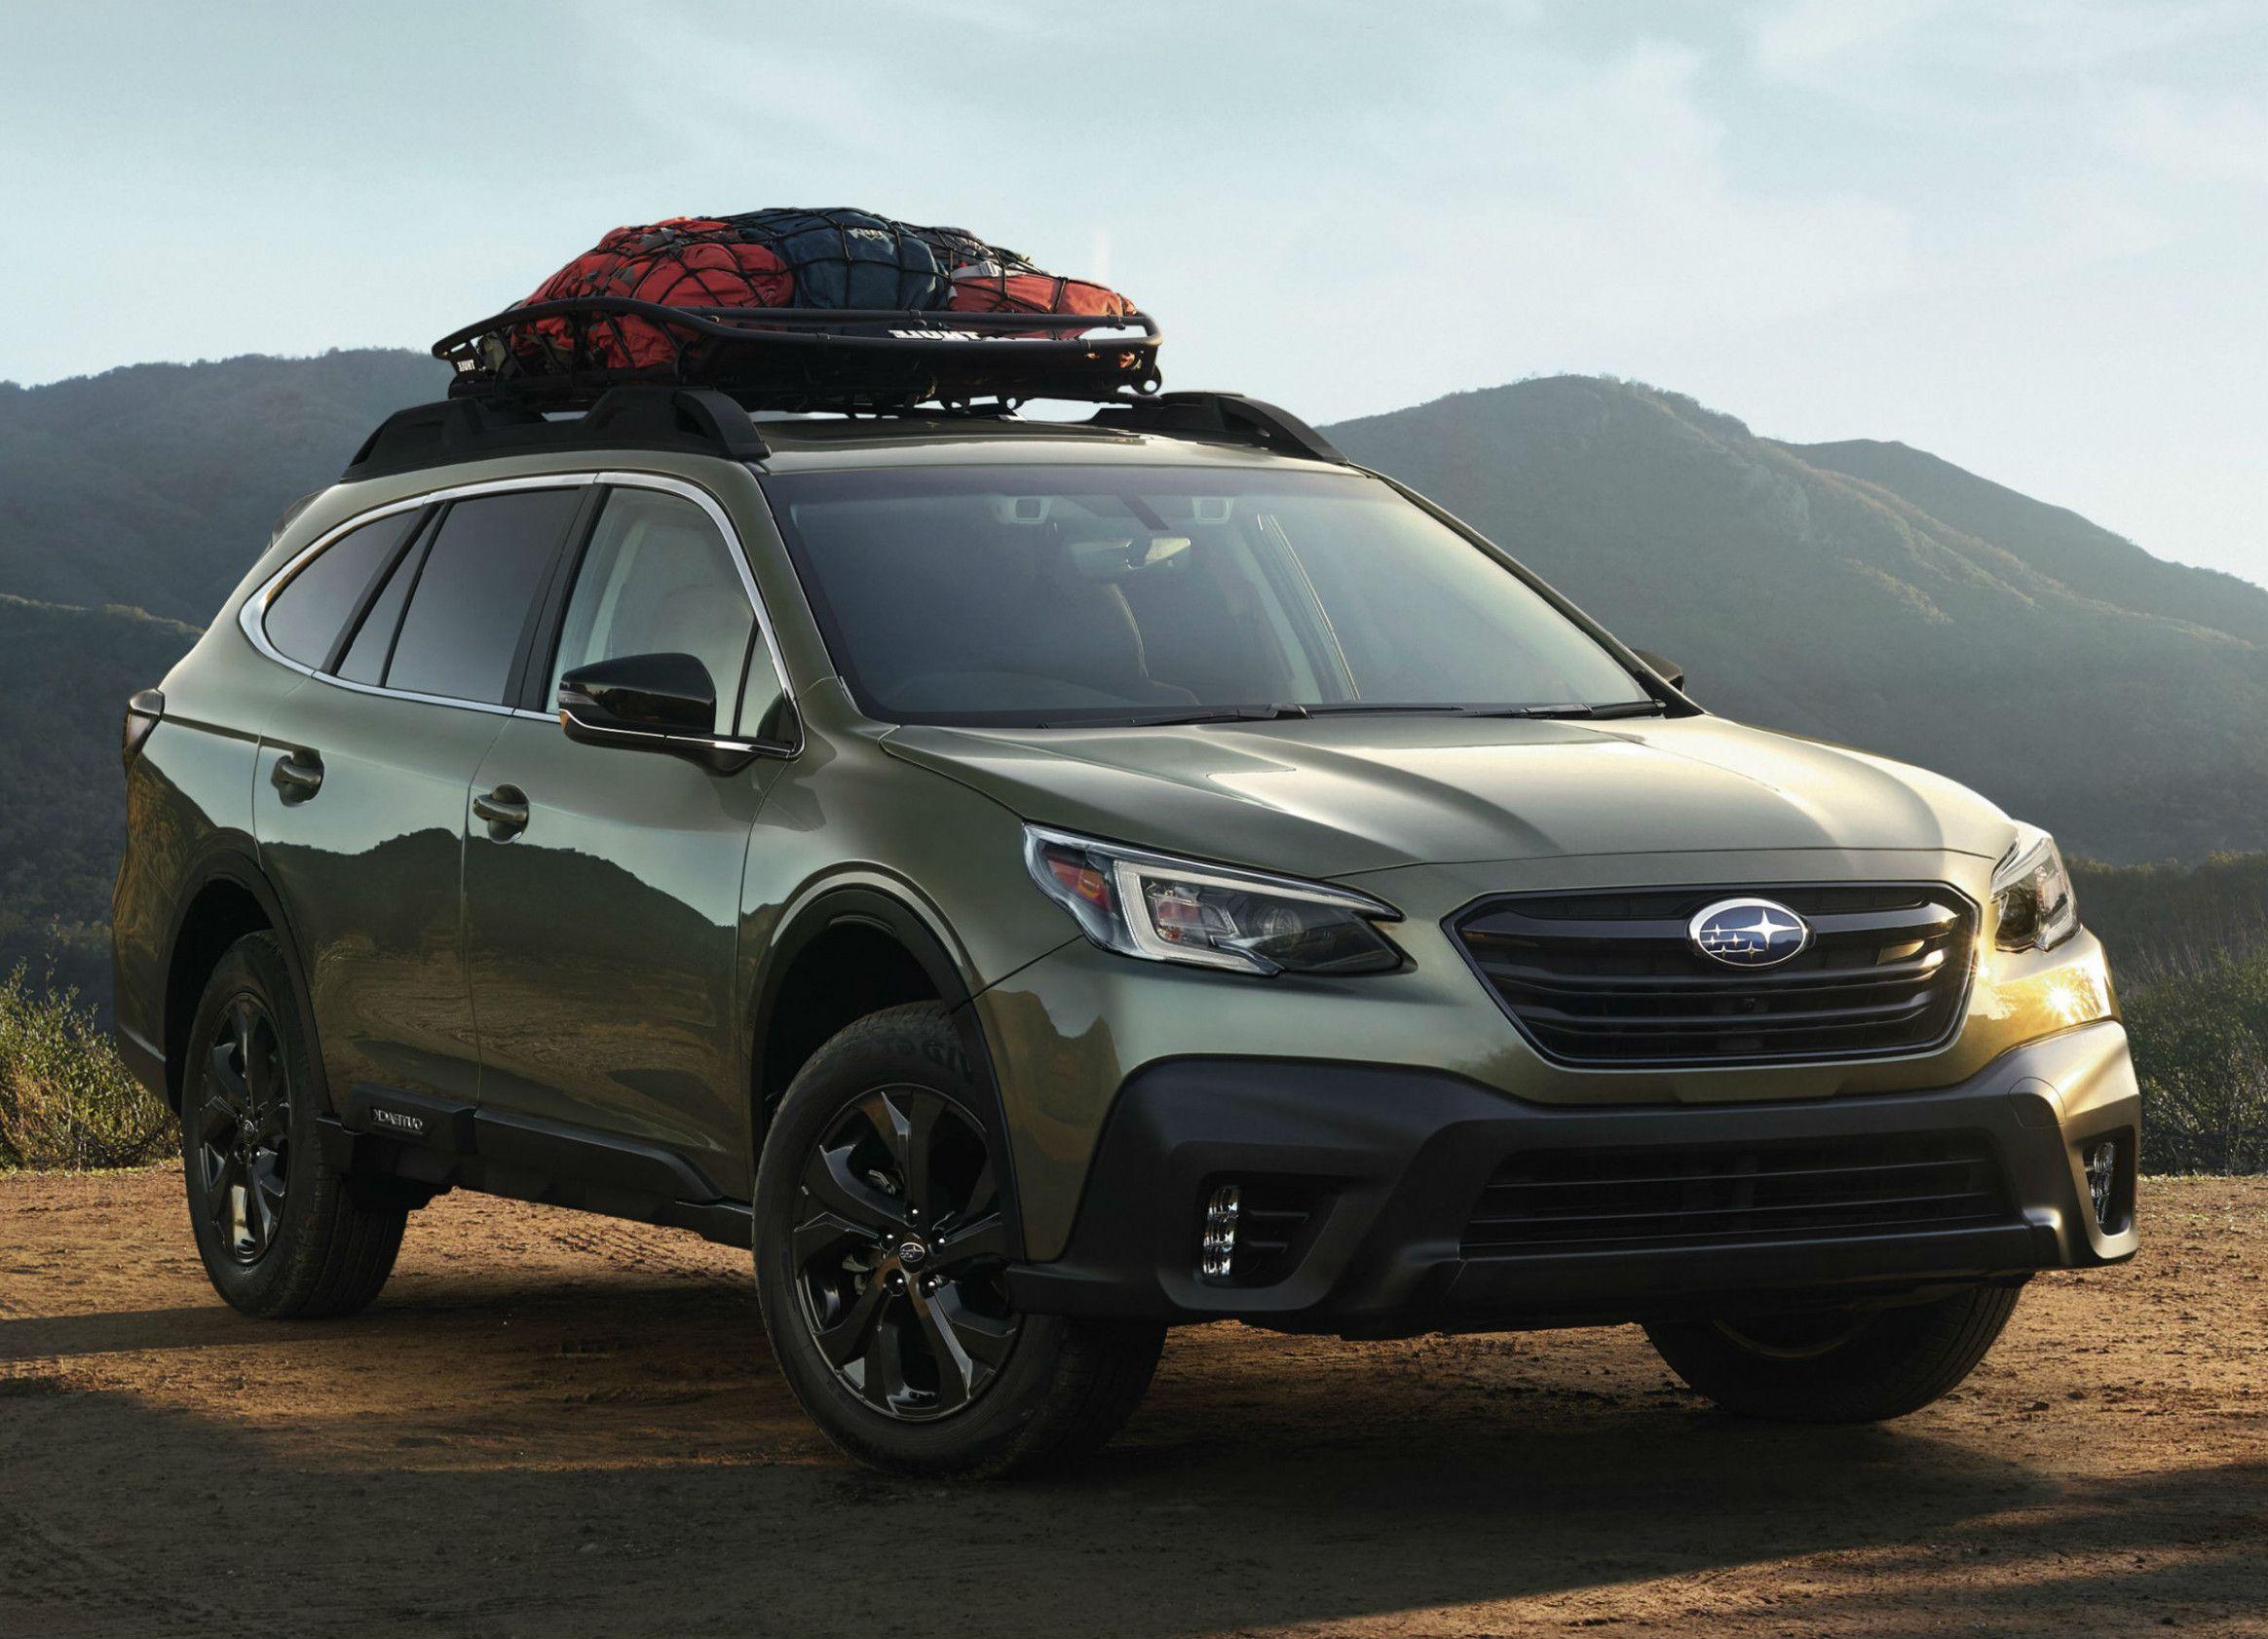 2020 Subaru Outback 2020 Subaru Outback Changes 2020 Subaru Outback Colors 2020 Subaru Outback Interior 2020 Subaru Outback Onyx Subaru Outback Subaru Outback